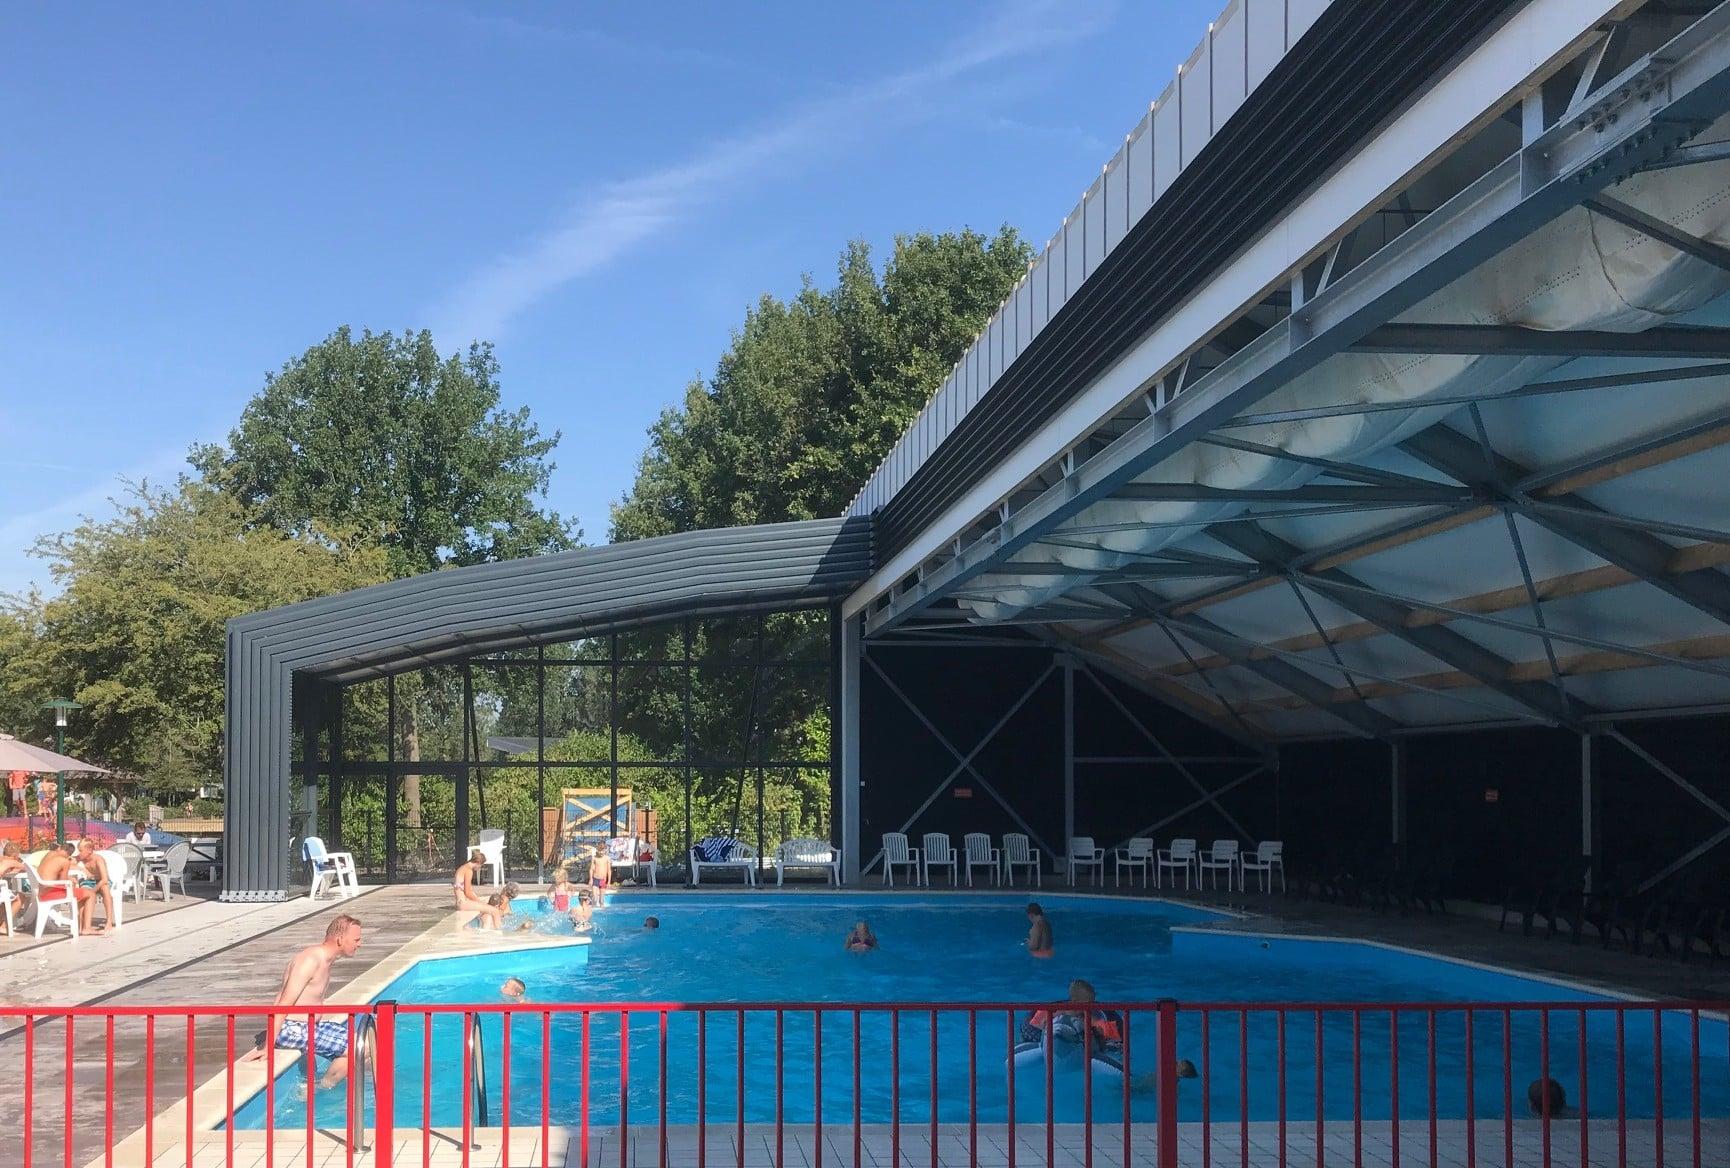 Abri de piscine Collectivités - Rheezerveen, Pays-Bas